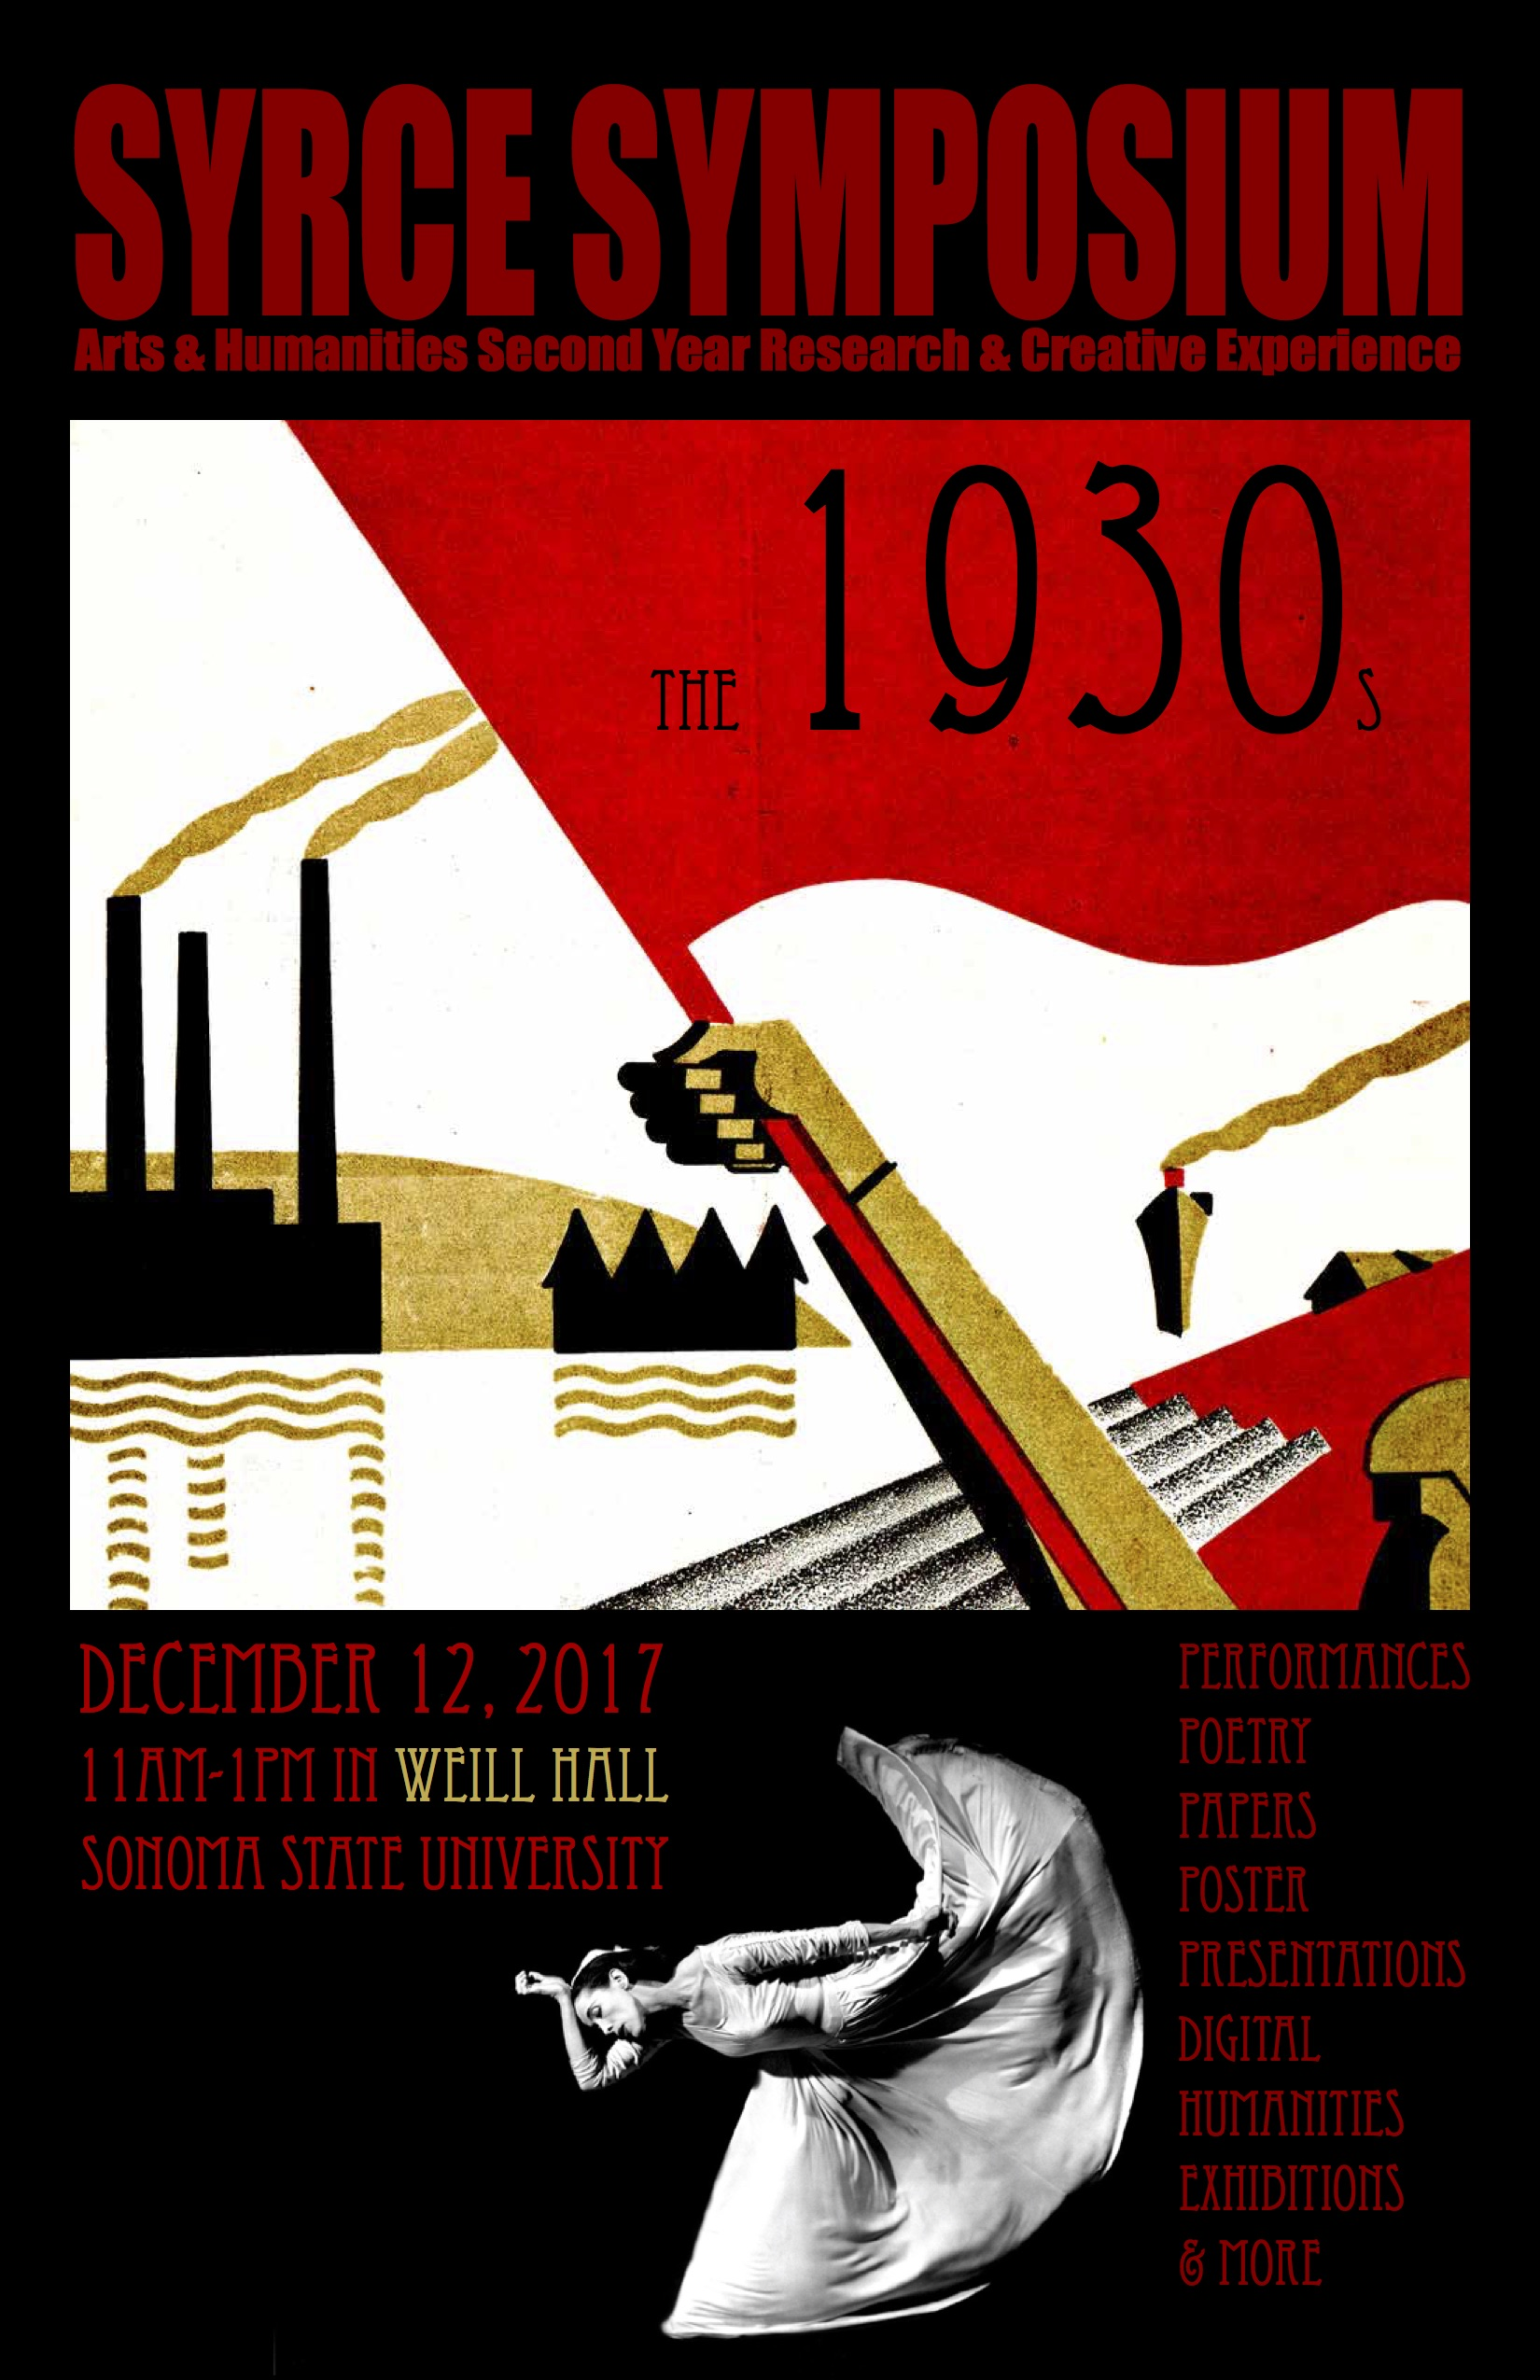 Syrce Symposium - the 1930s